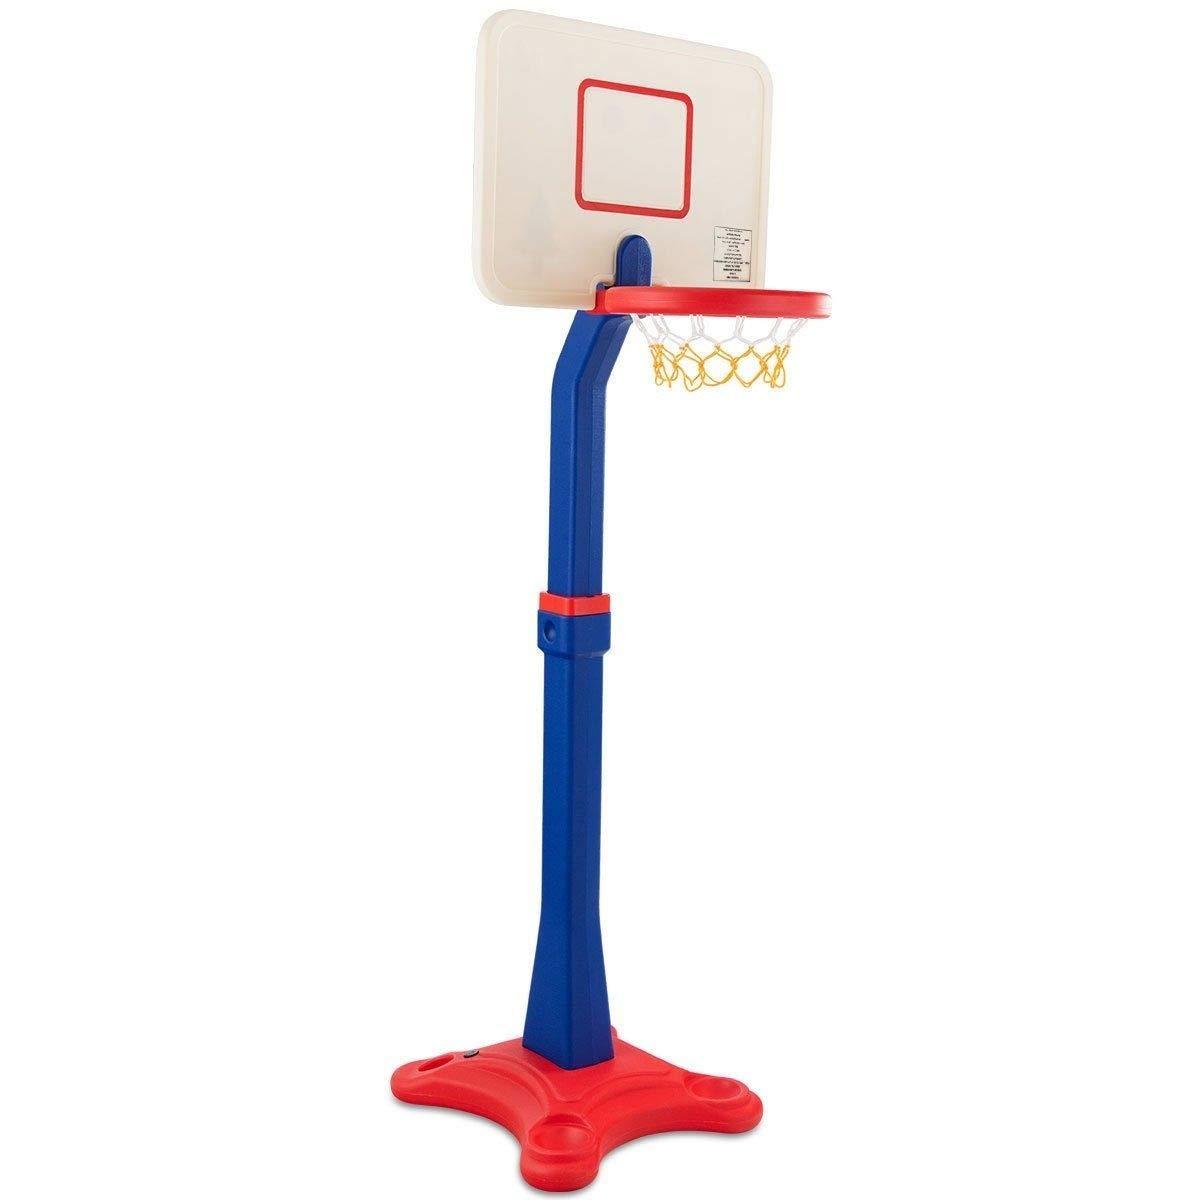 Heize ベストプライス キッズ 子供 男の子 女の子 高さ調節可能 アウトドア インドア バスケットボール ネットフープ 高さスタンド バスケットフープシステム スタンド ゴールネットリング スポーツ ハンギングボールバスケット おもちゃゲーム (米国在庫) B07P5TK5XM